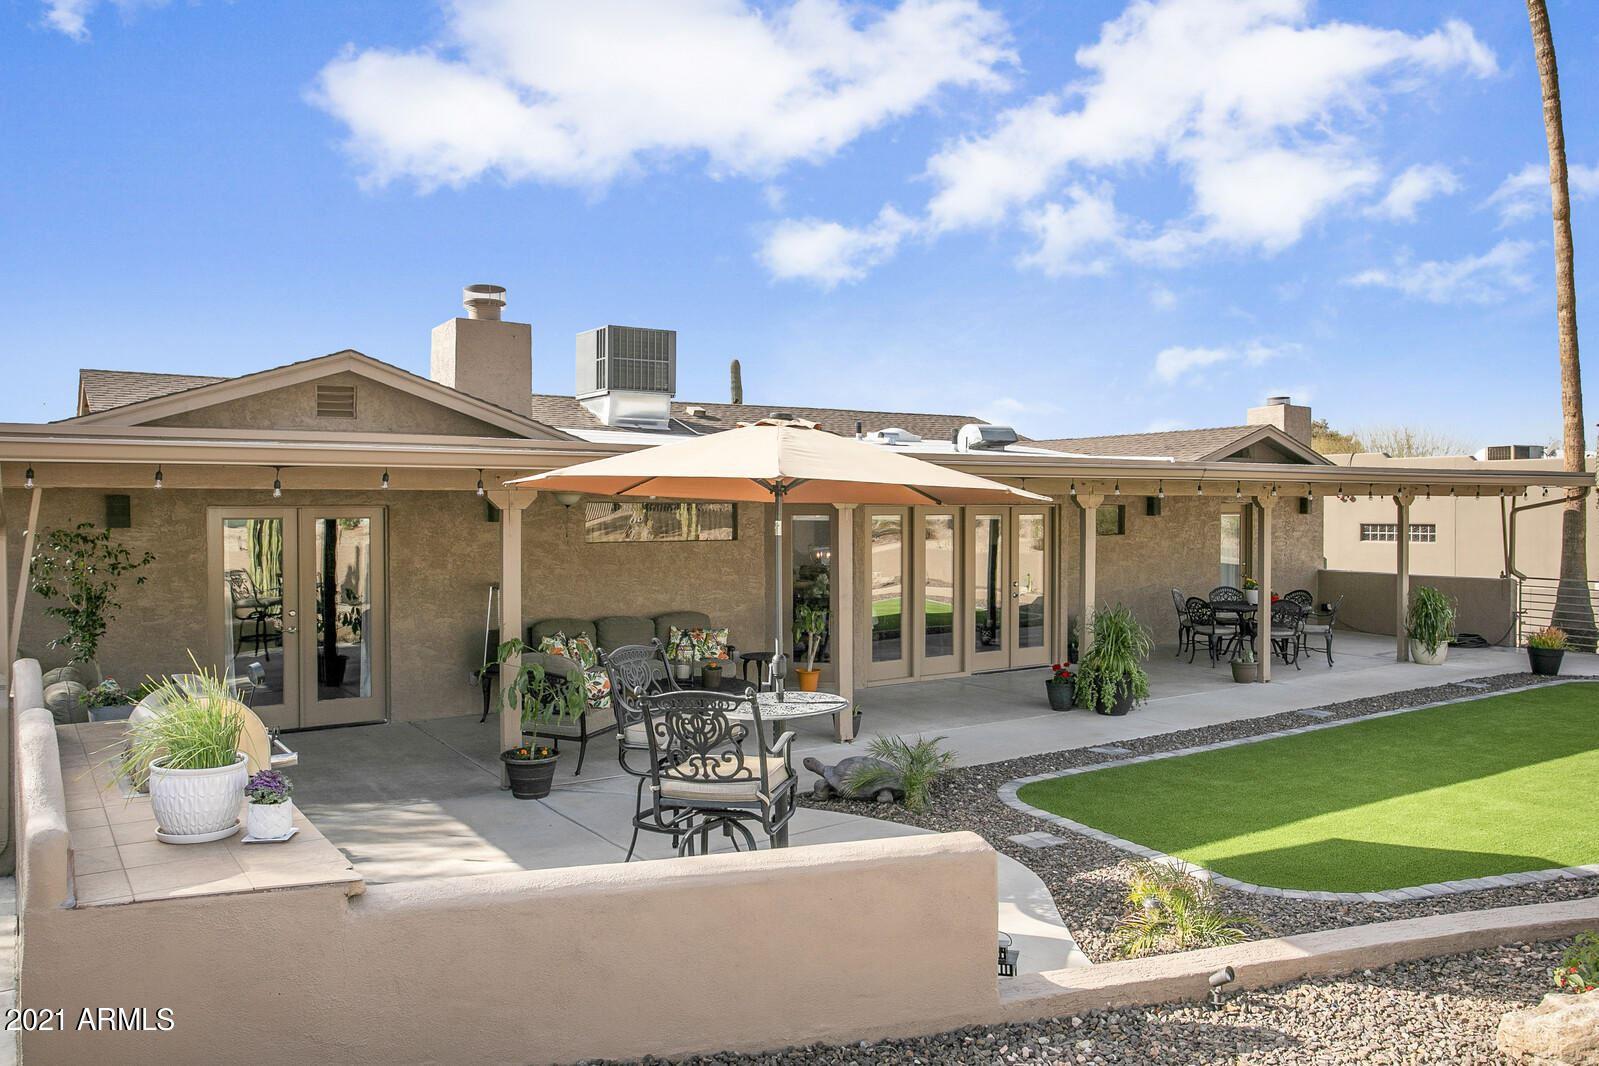 1534 E LAS PALMARITAS Drive, Phoenix, AZ 85020 - MLS#: 6196427